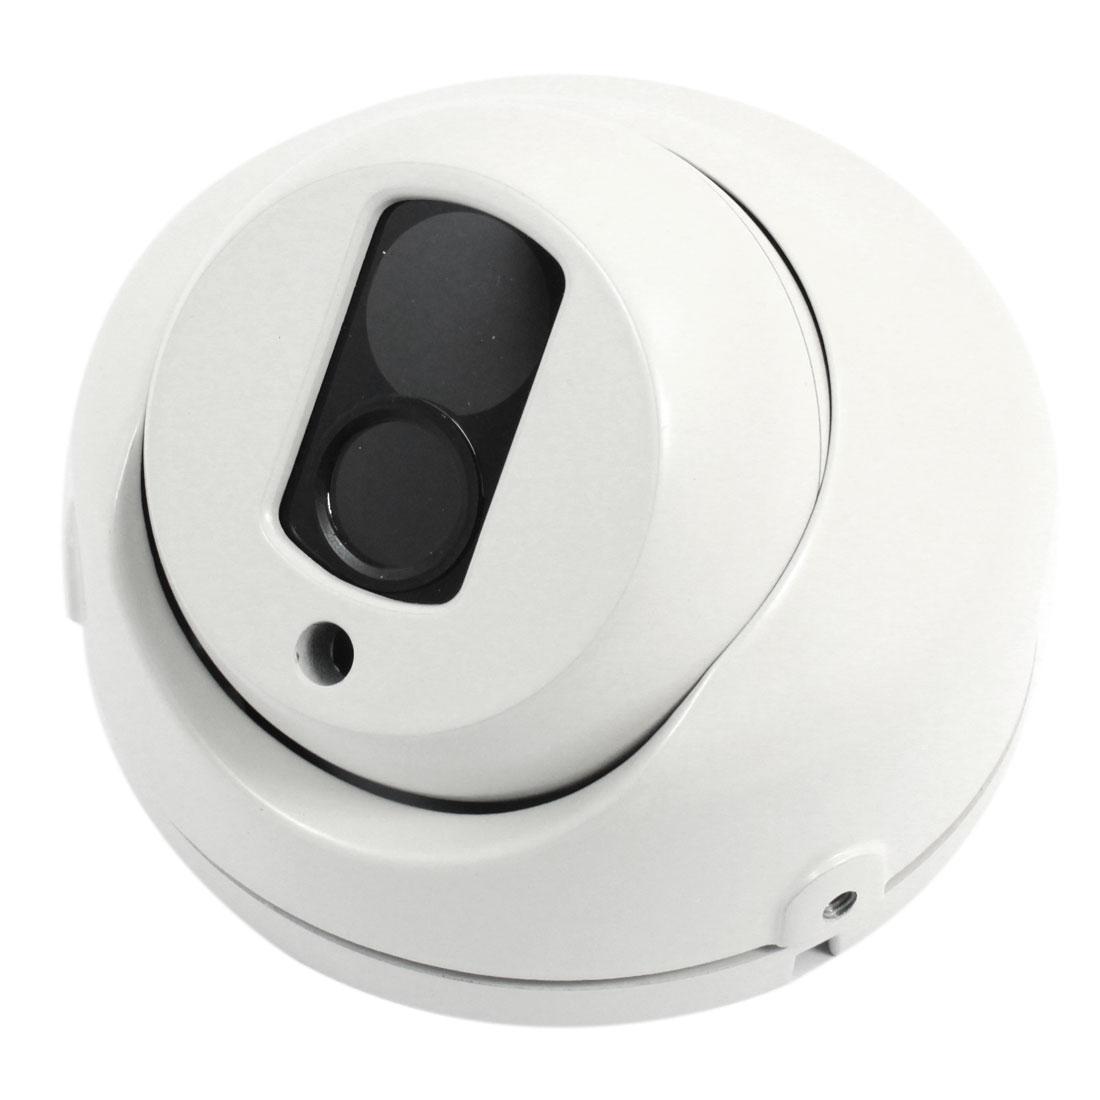 "Surveillance White Metal CCTV Dome Camera Housing Case 4.7"" Dia"